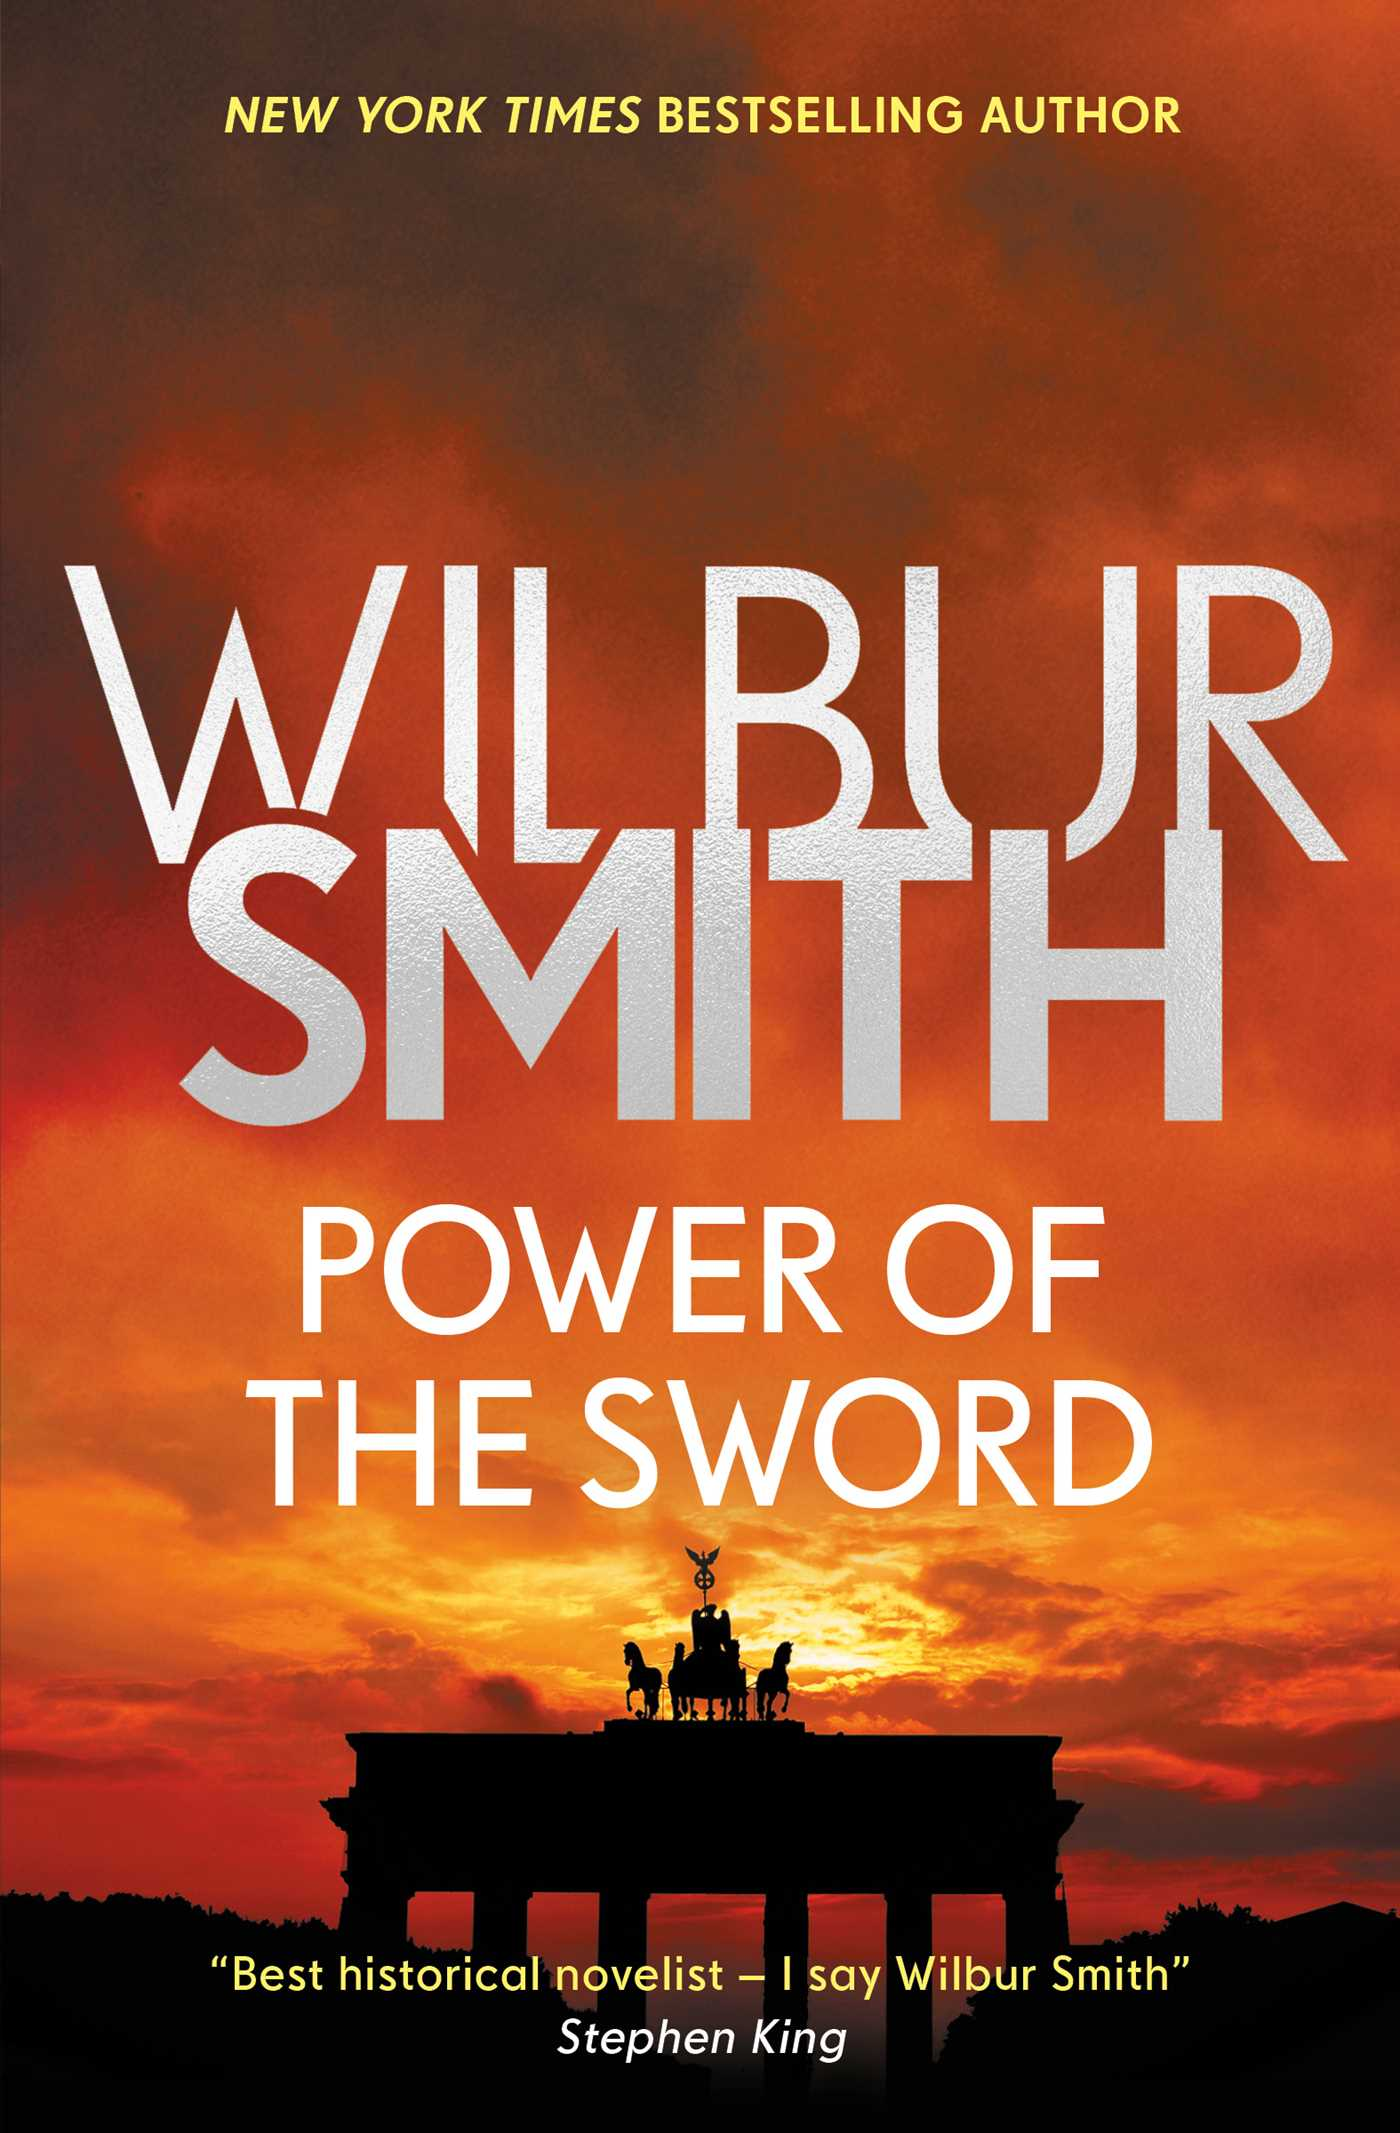 Power of the sword 9781499860726 hr